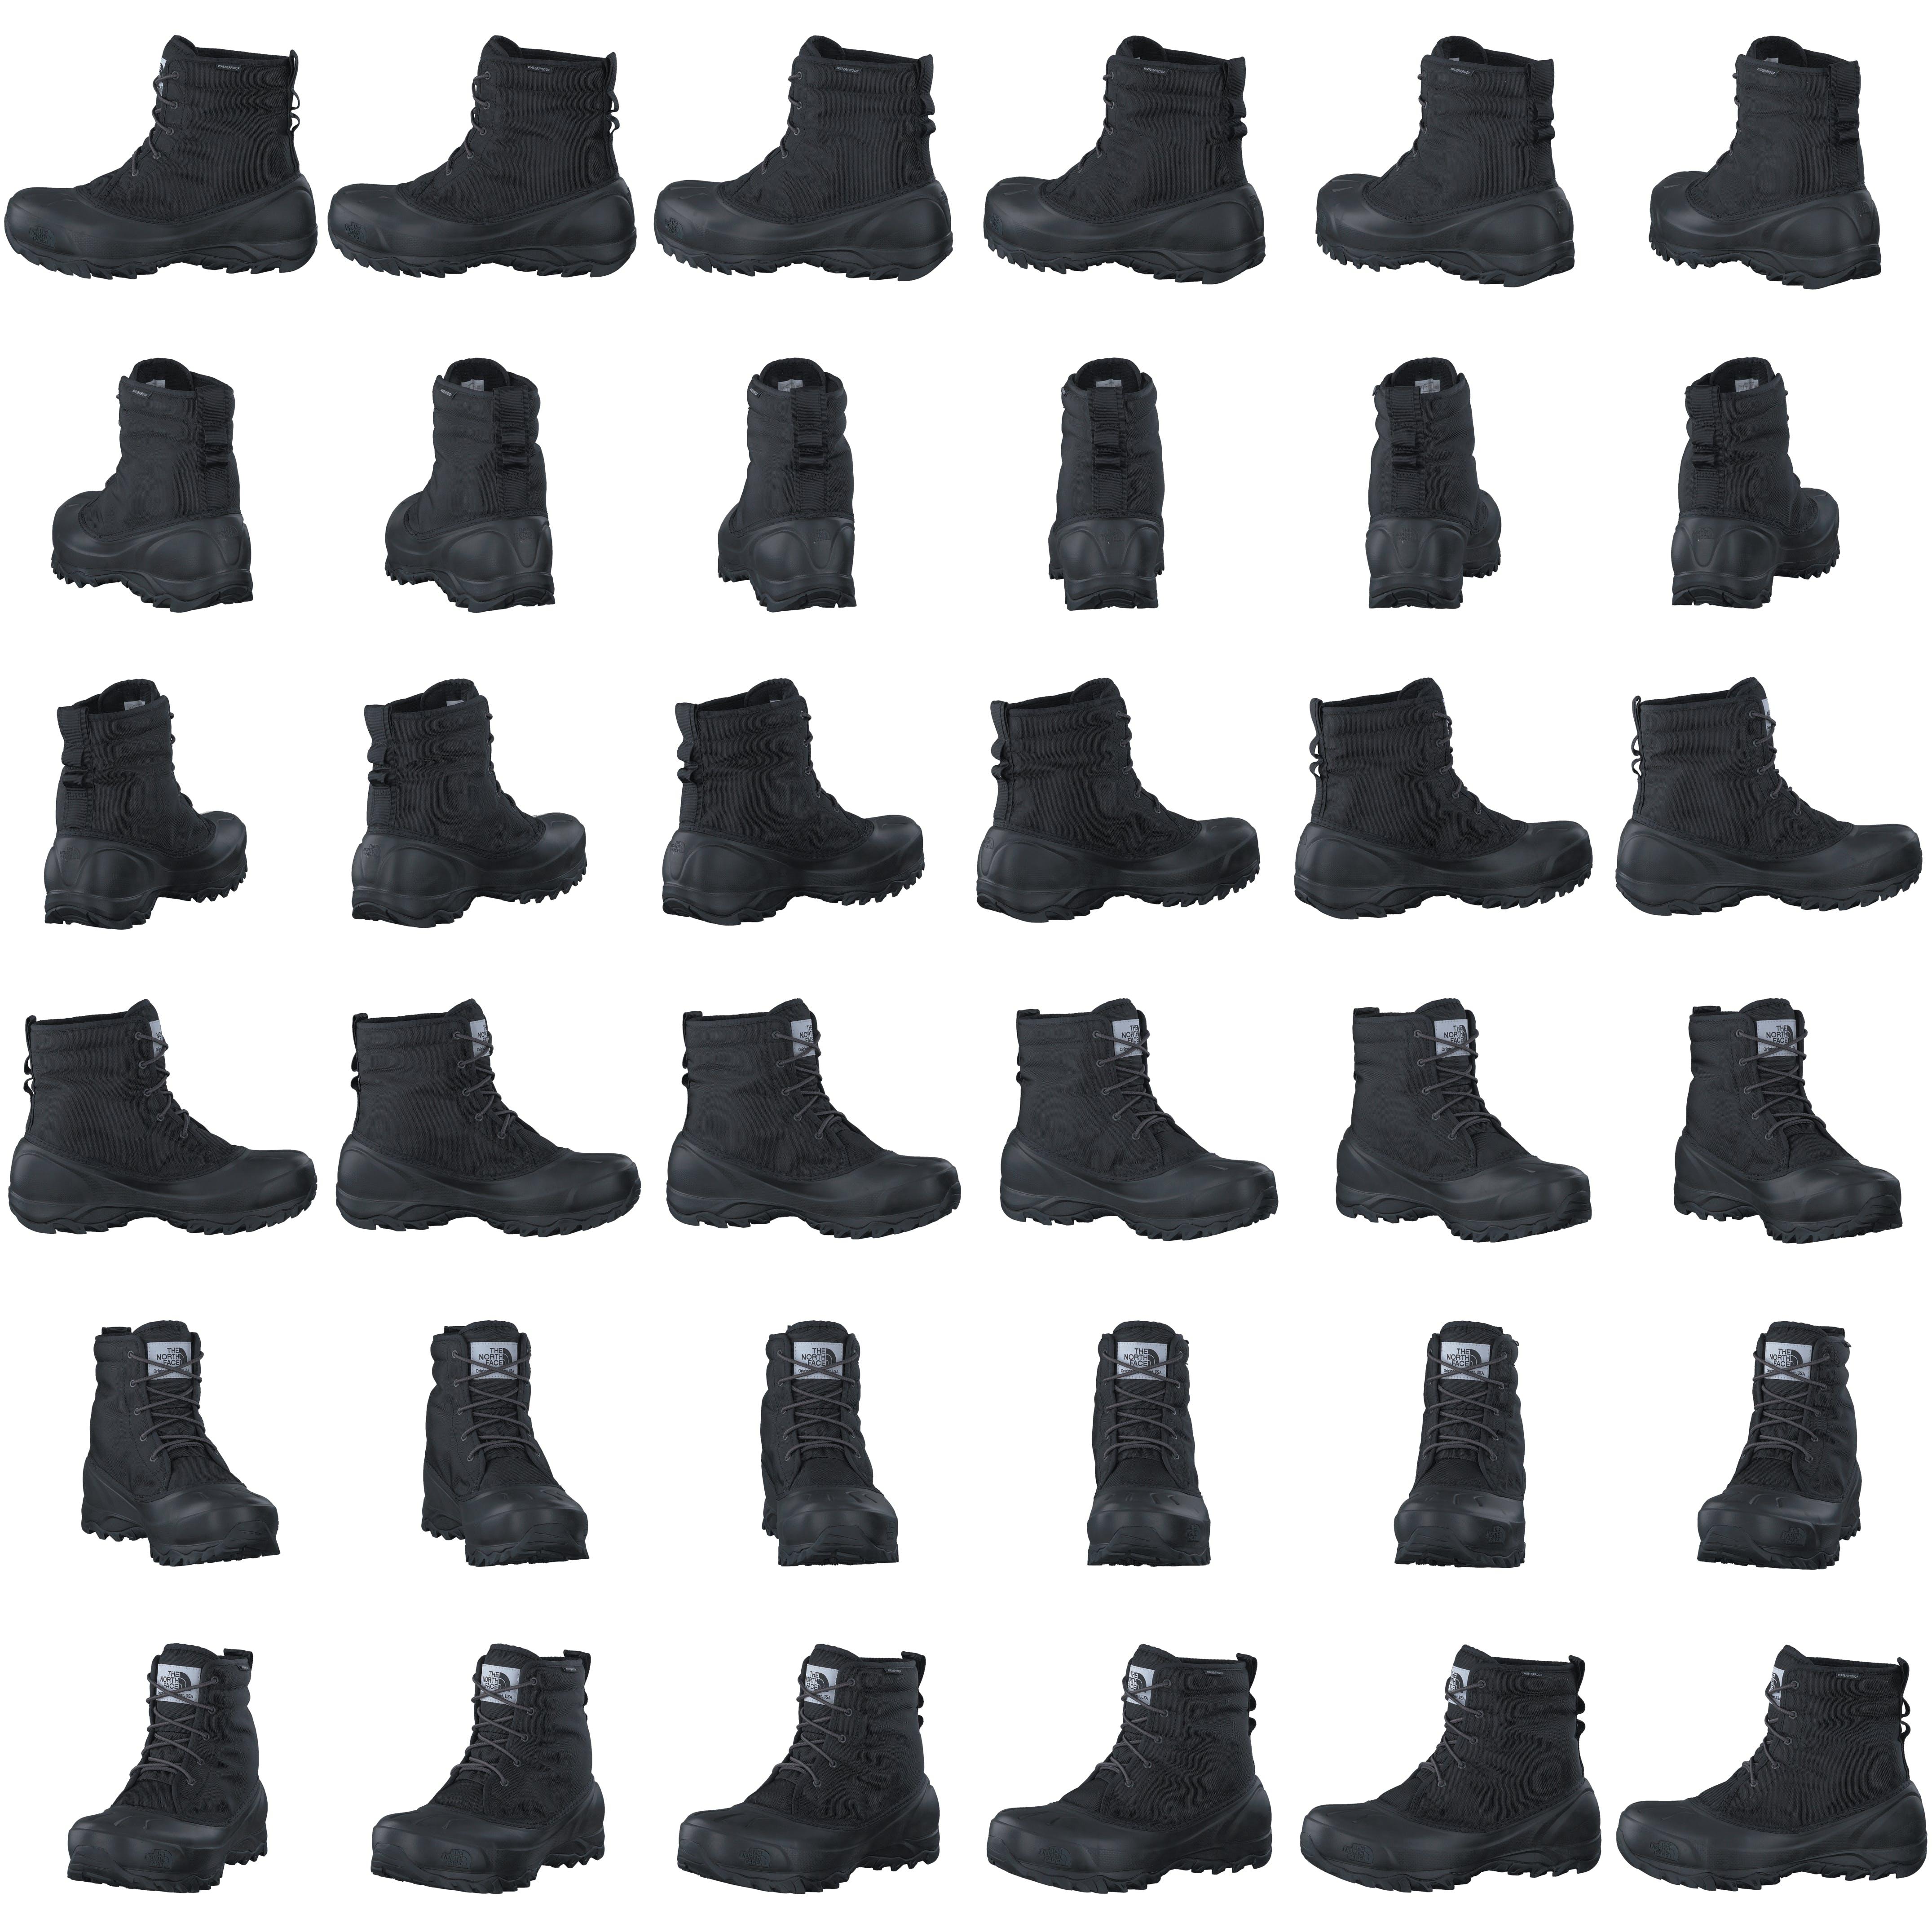 43e0e5dabc The North Face Men's Tsumoru Boot TNF Black/ Dark Shadow Grey schwarze  Schuhe Kaufen Online | FOOTWAY.de